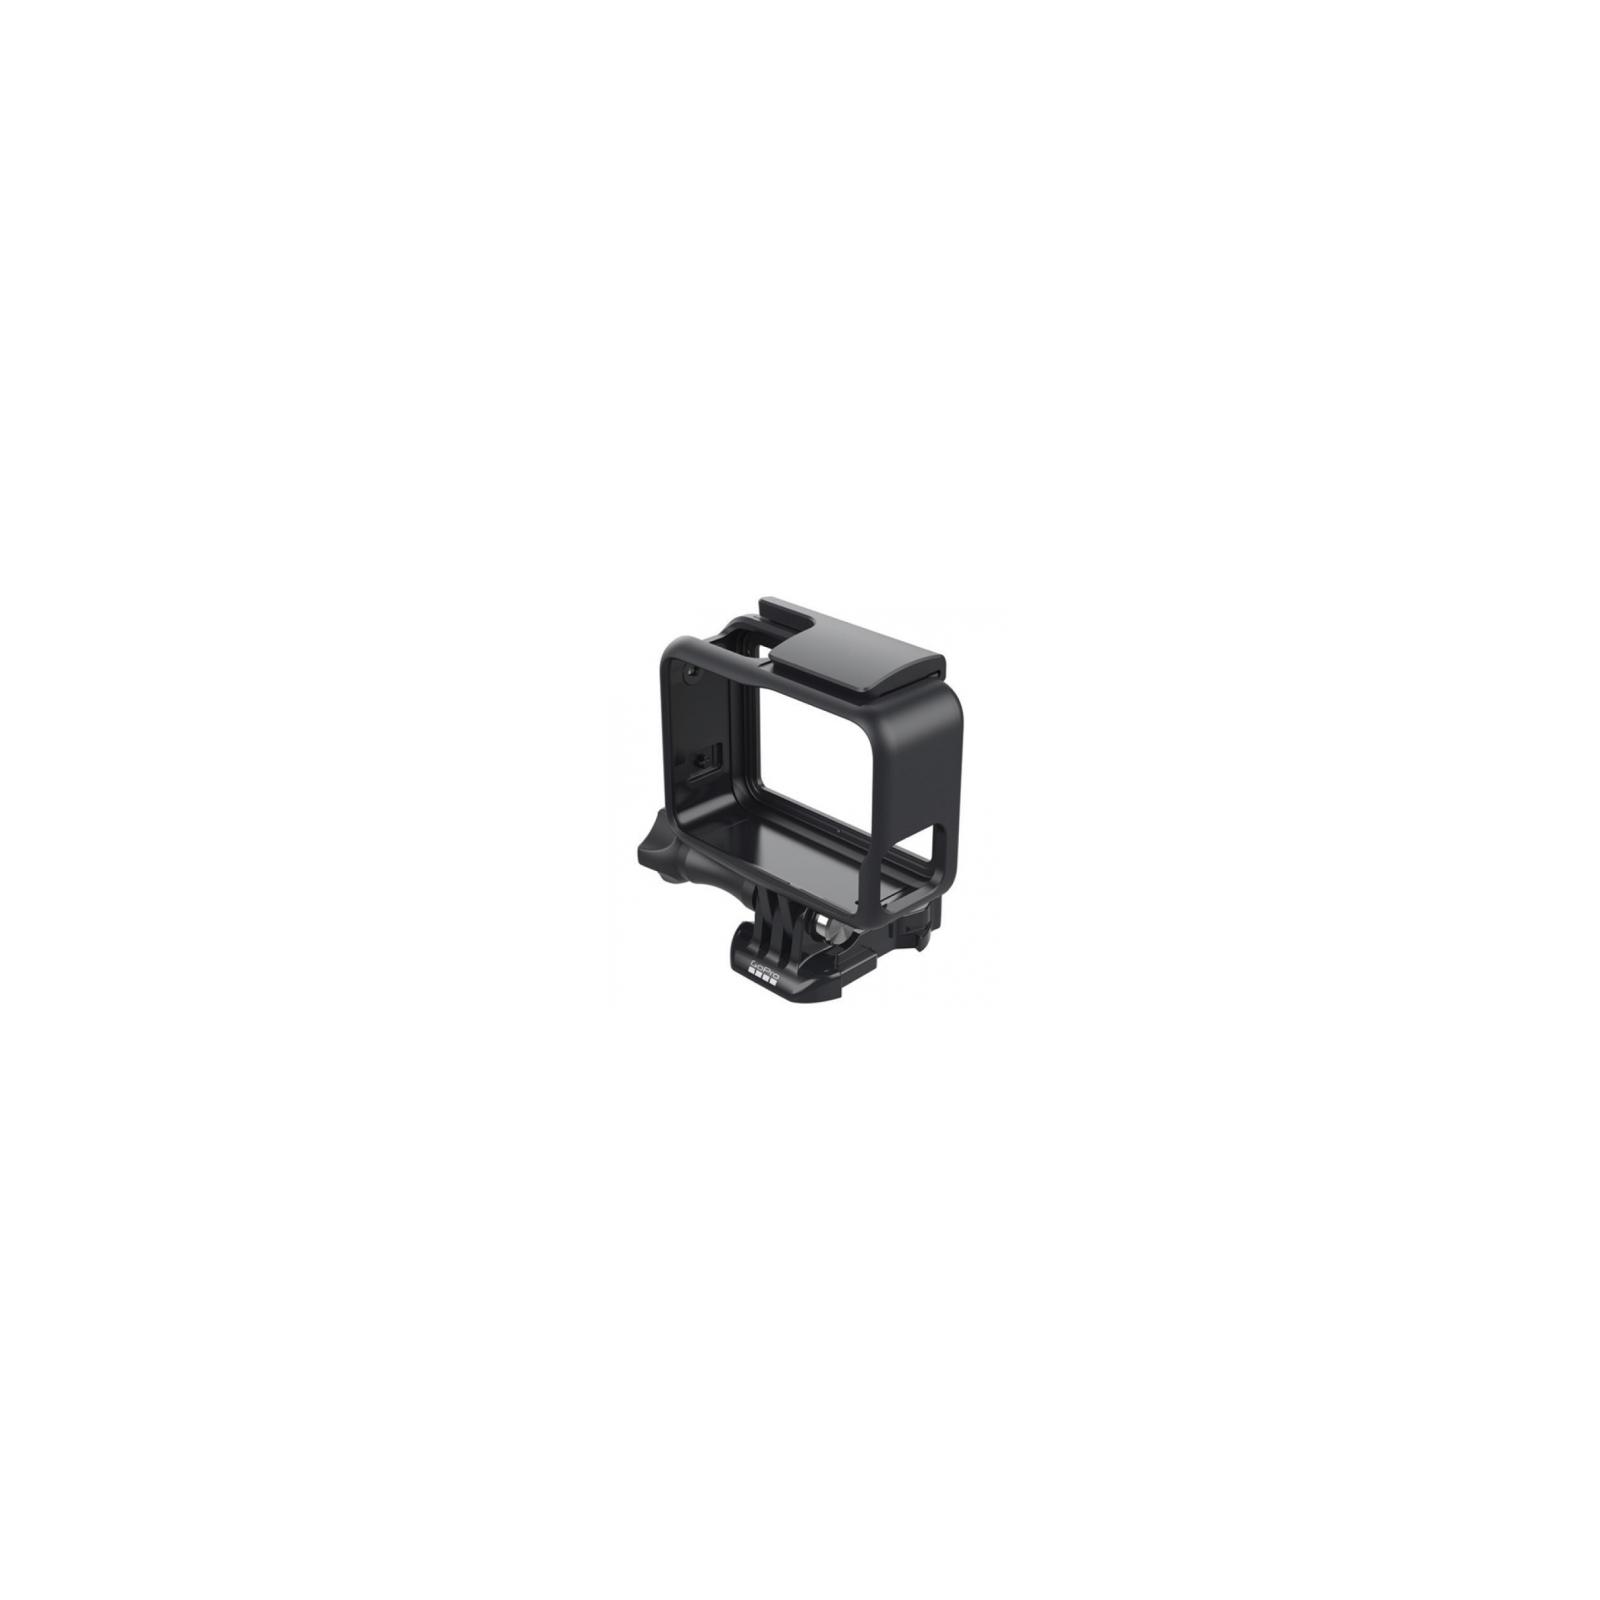 Аксессуар к экшн-камерам GoPro The Frame (AAFRM-001)